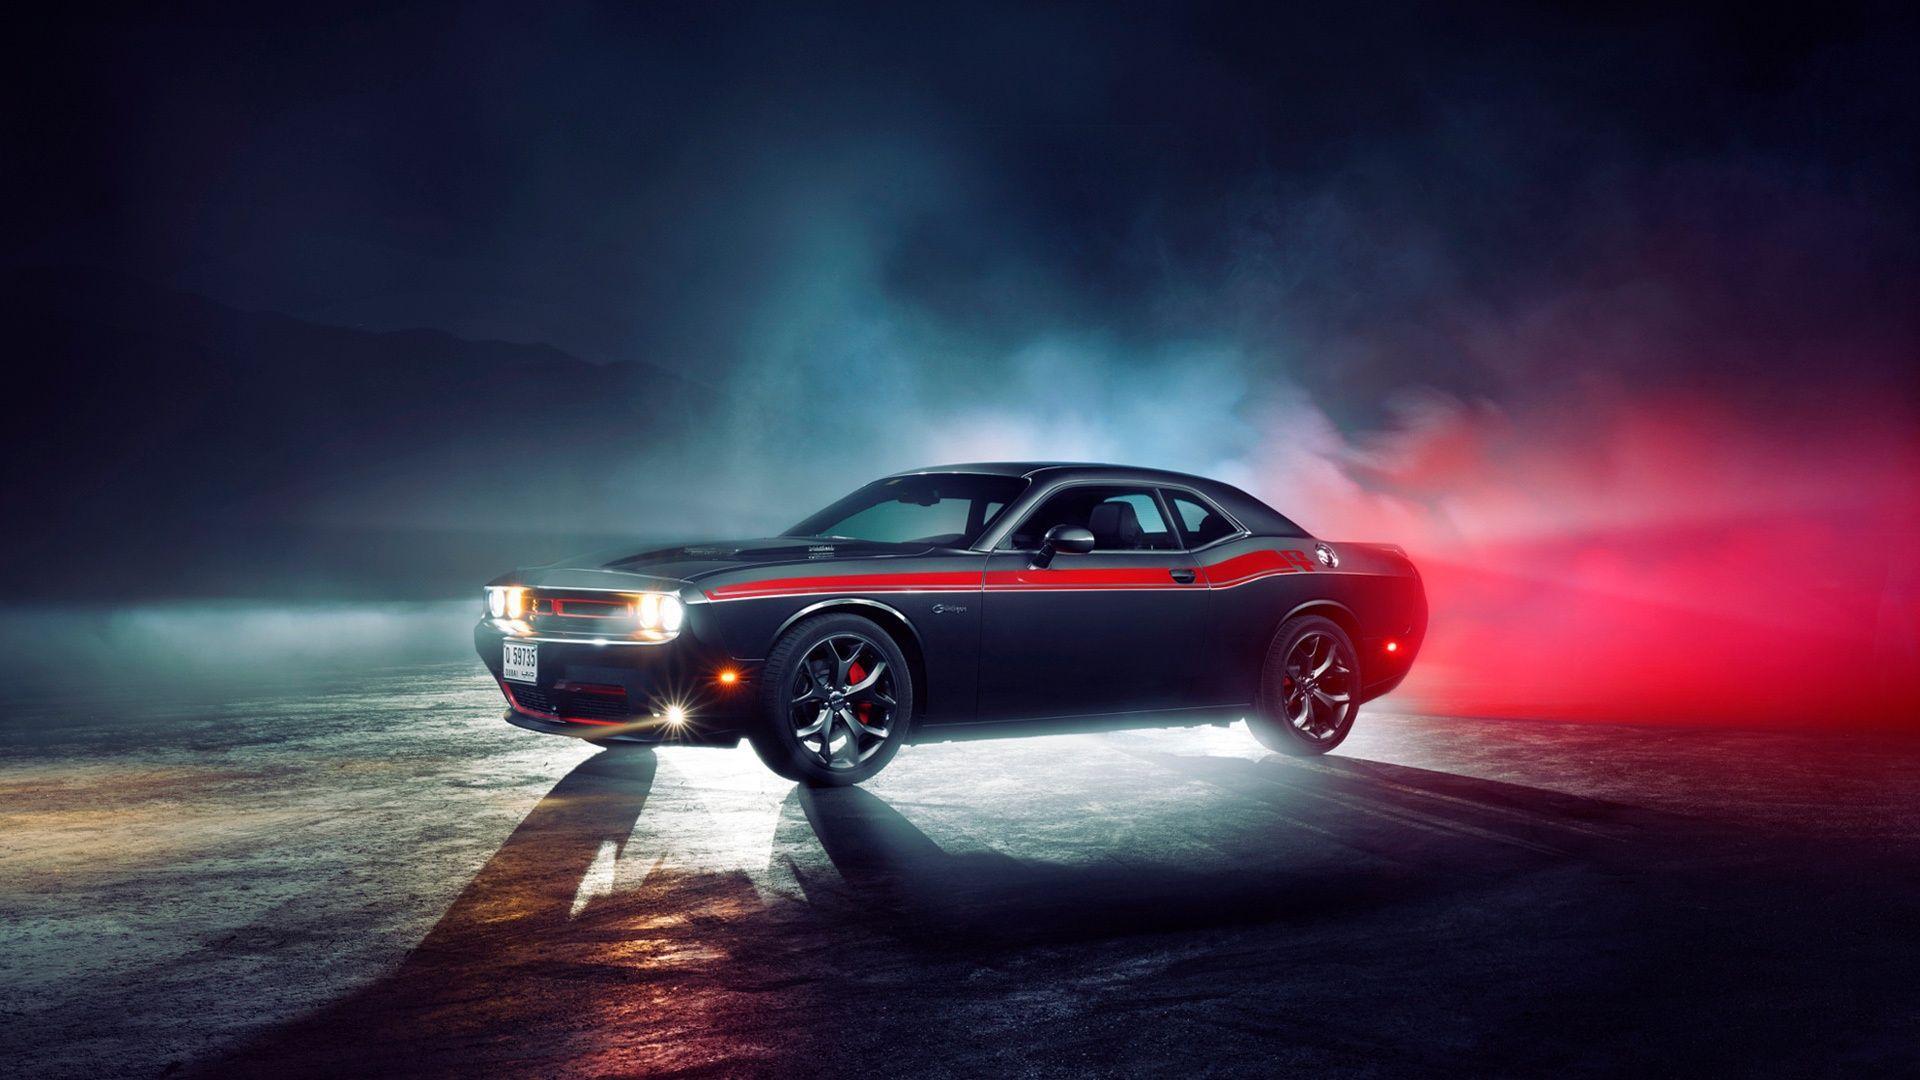 Light Car Wallpapers Top Free Light Car Backgrounds